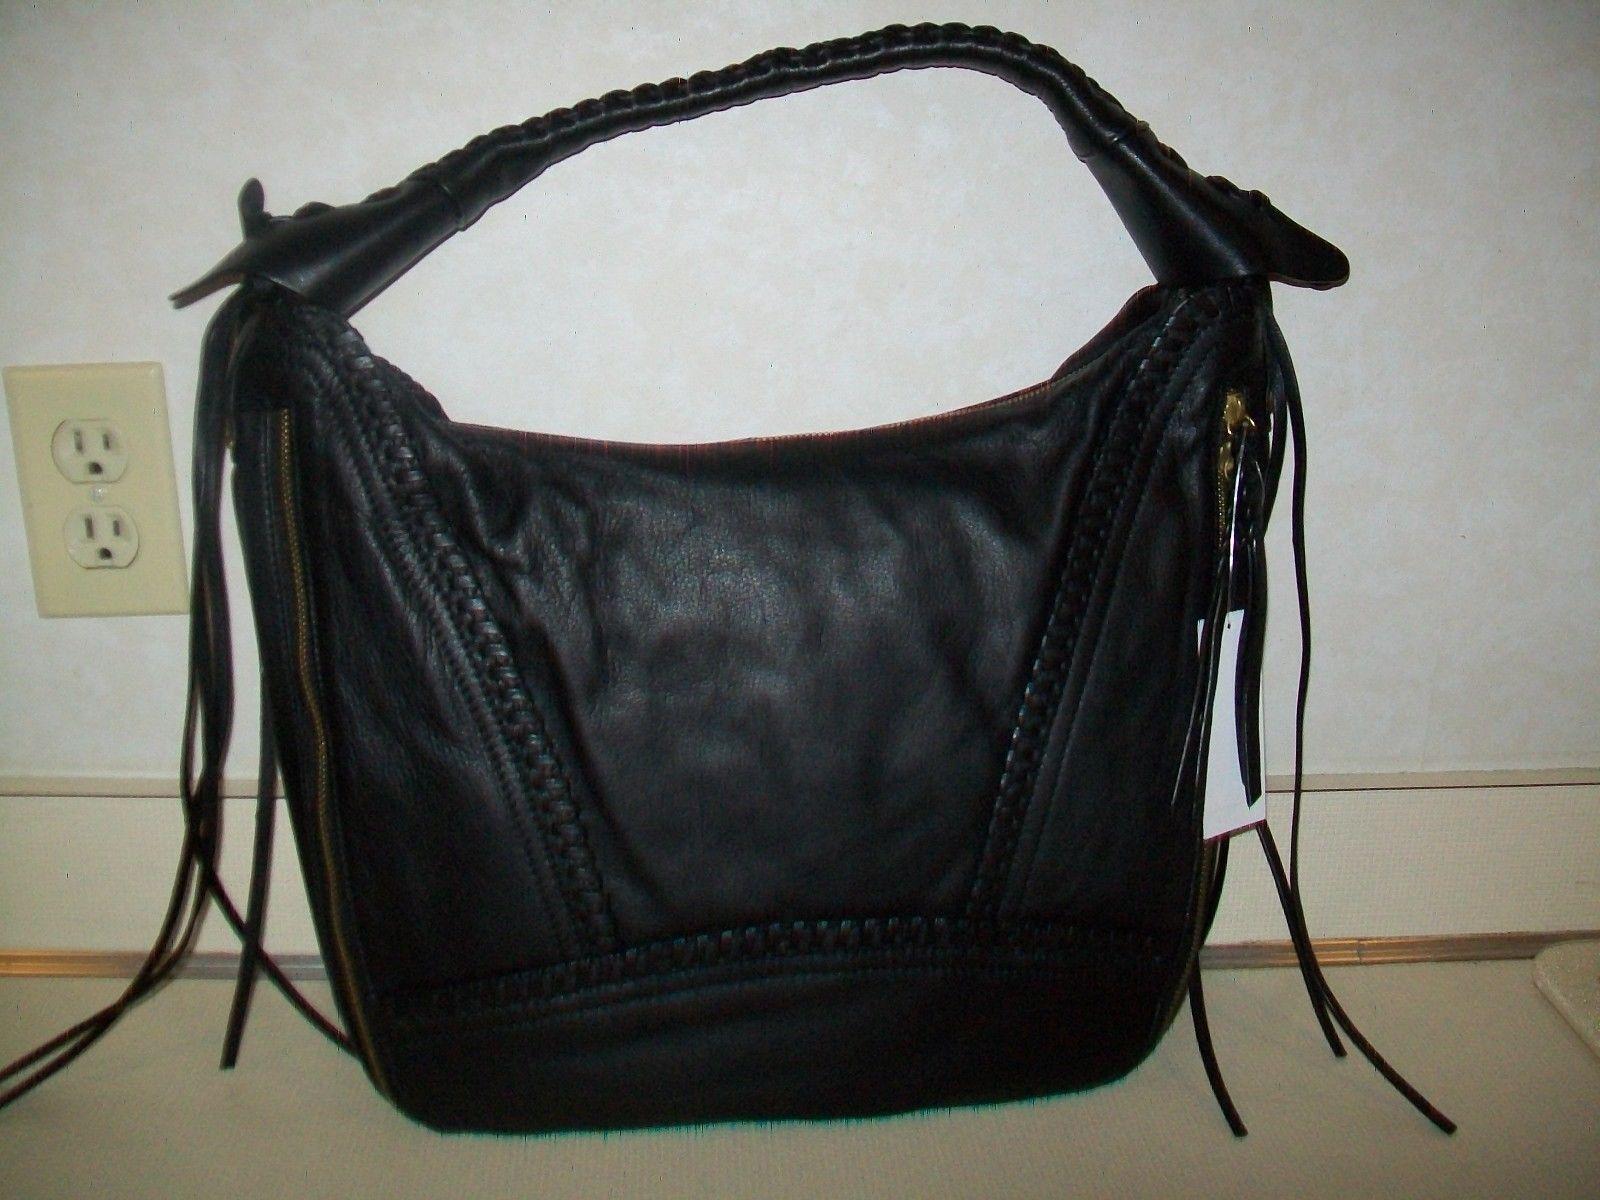 1d26eb5b87 orYANY Soft Nappa Leather MICHELLE Purse Handbag Hobo QVC   A270292 Black  NWT  89.99